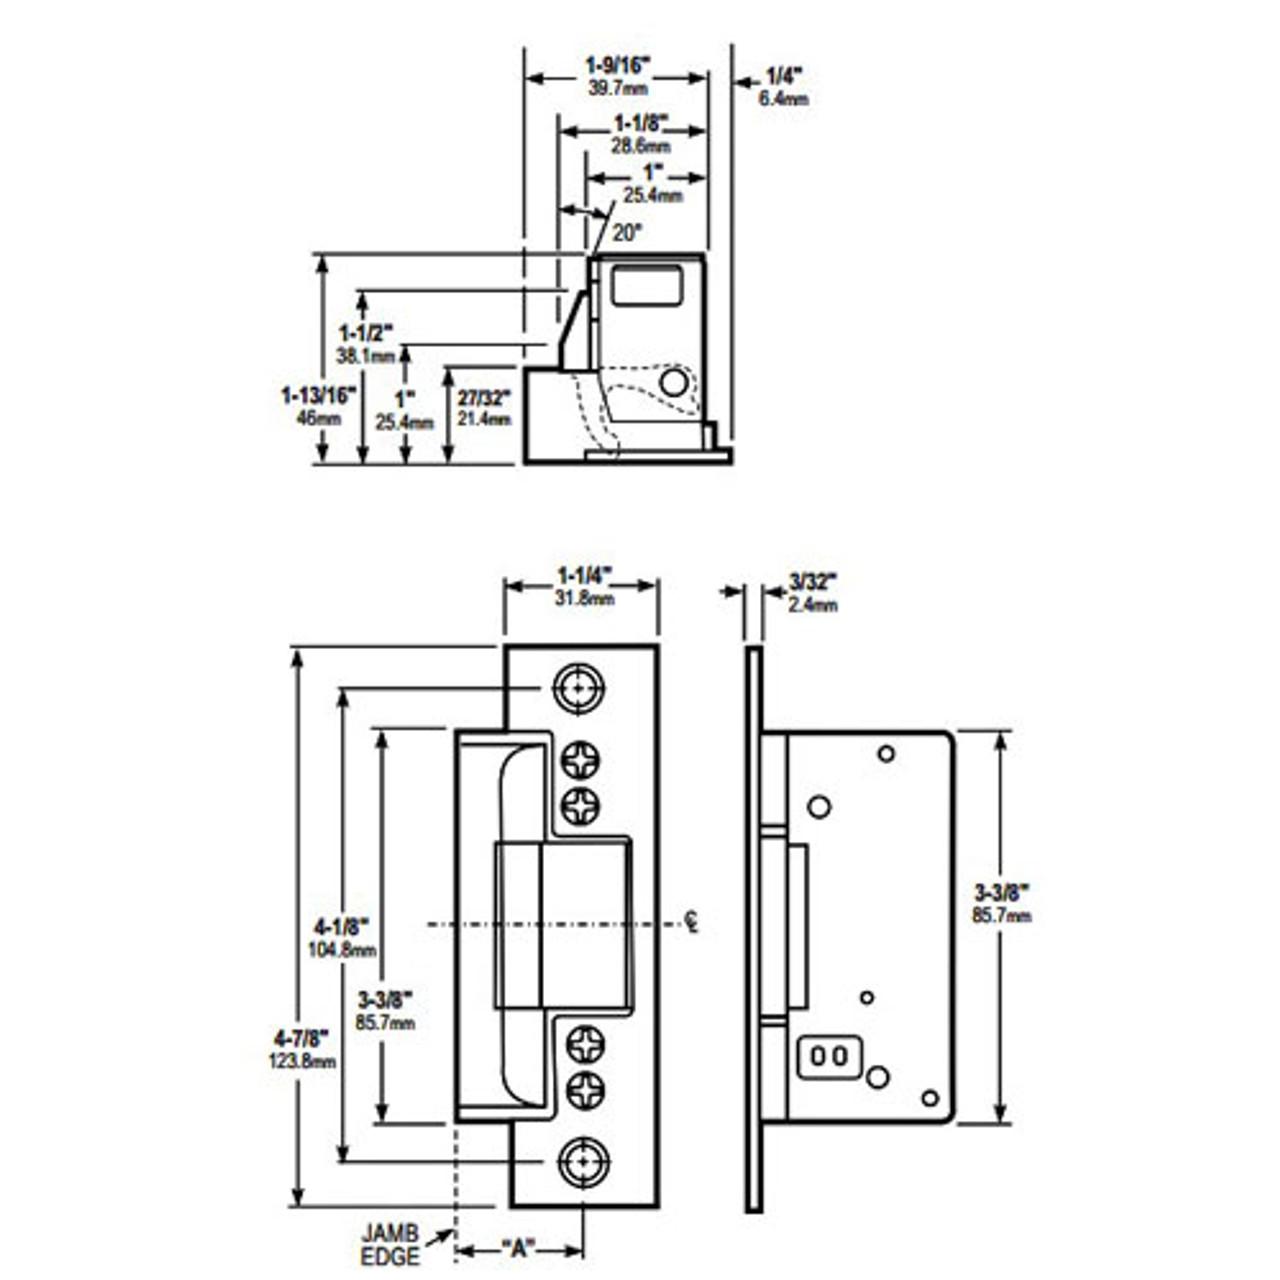 7170-545-628-50 Adams Rite Electric Strike Dimensional View